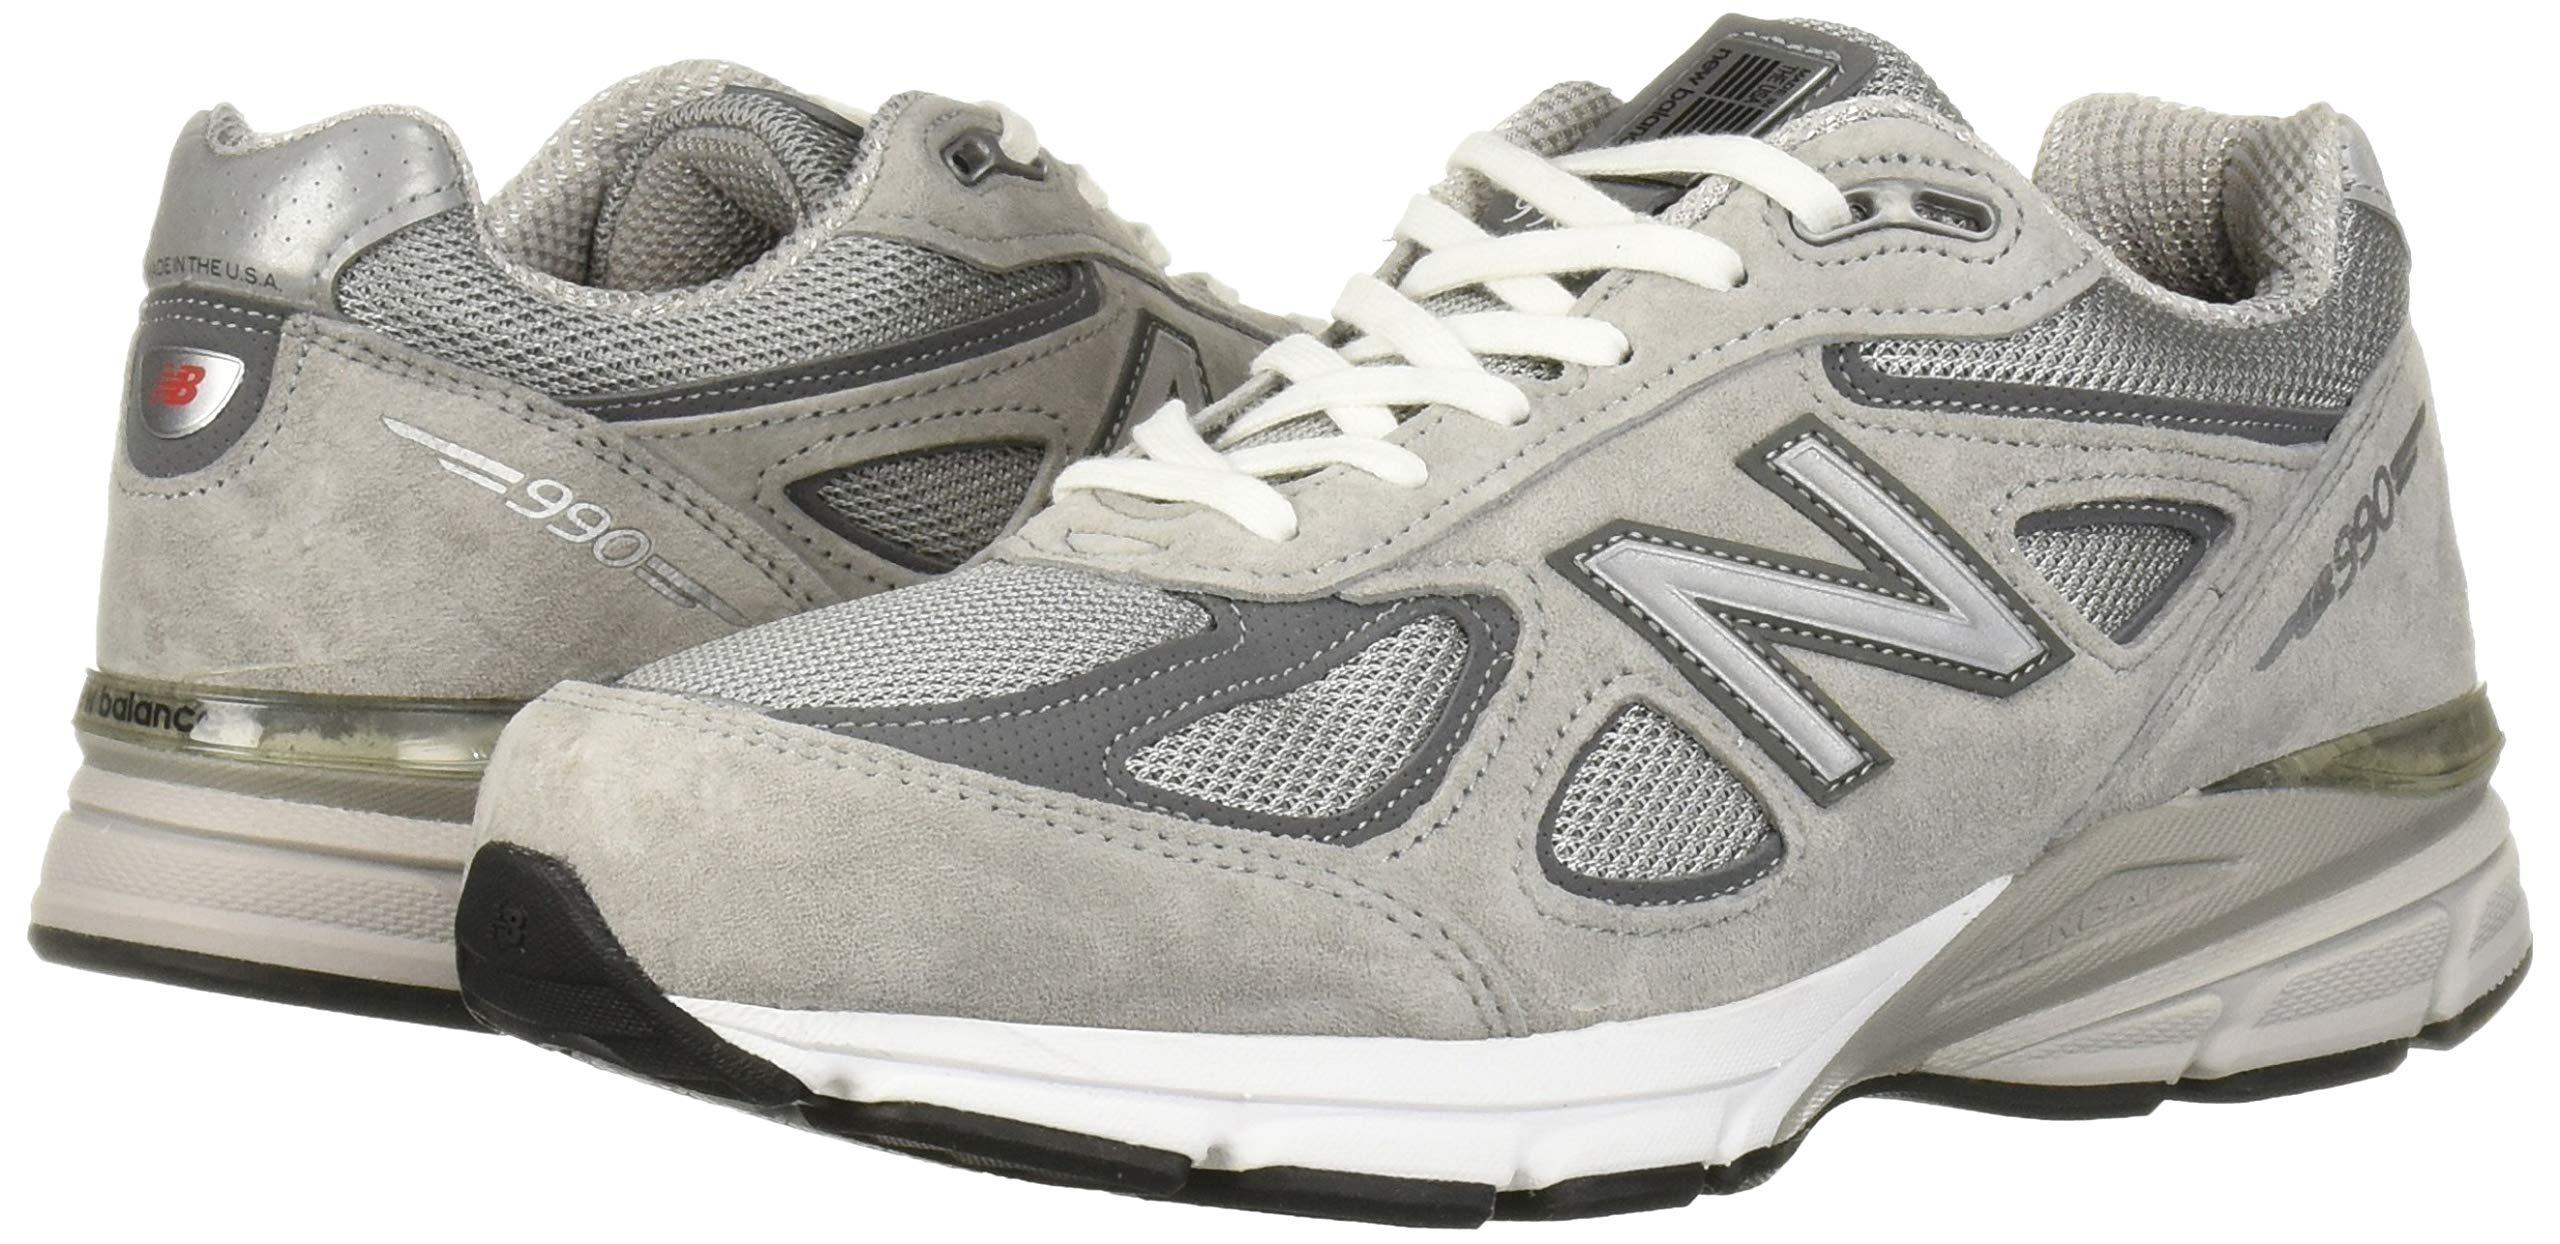 812%2By%2BV3v3L - New Balance Men's 990v4 Running Shoe